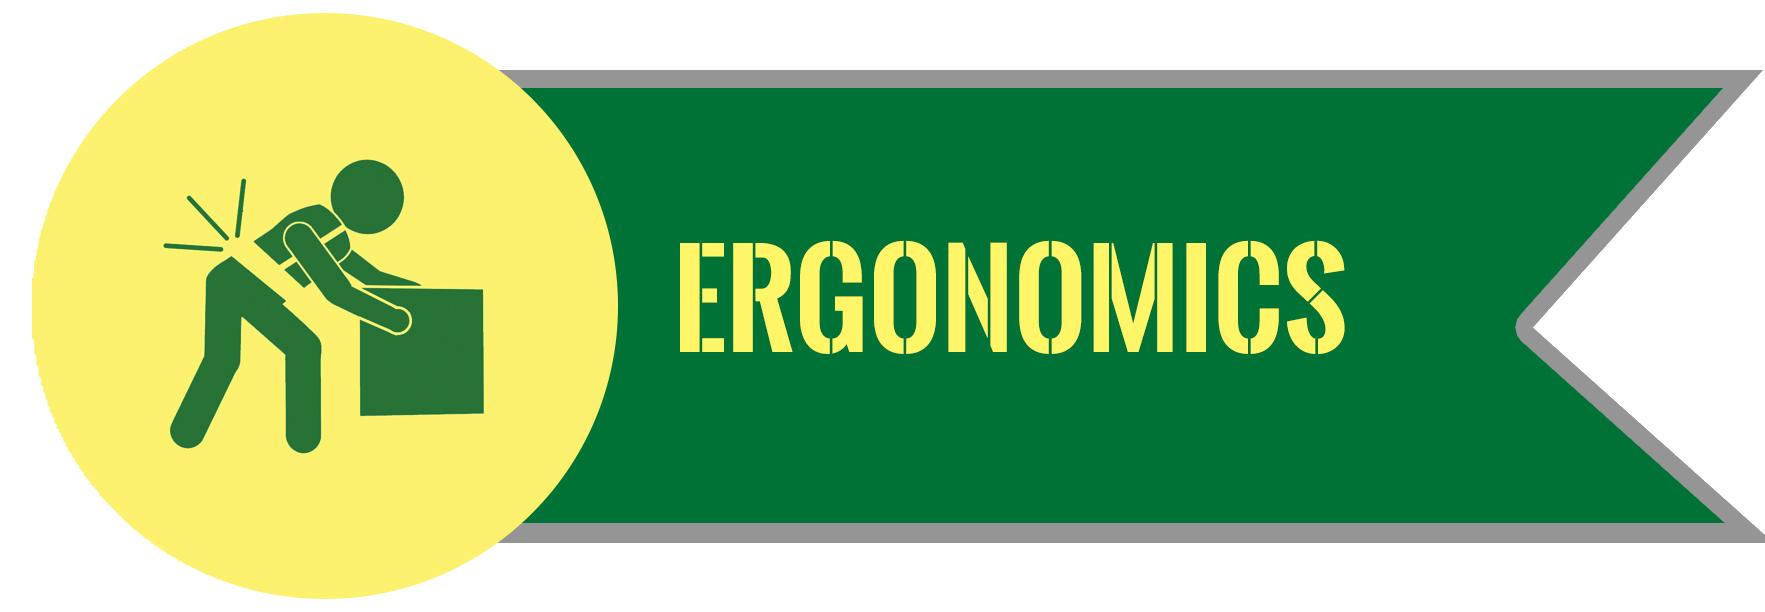 ergonomics3-768x266